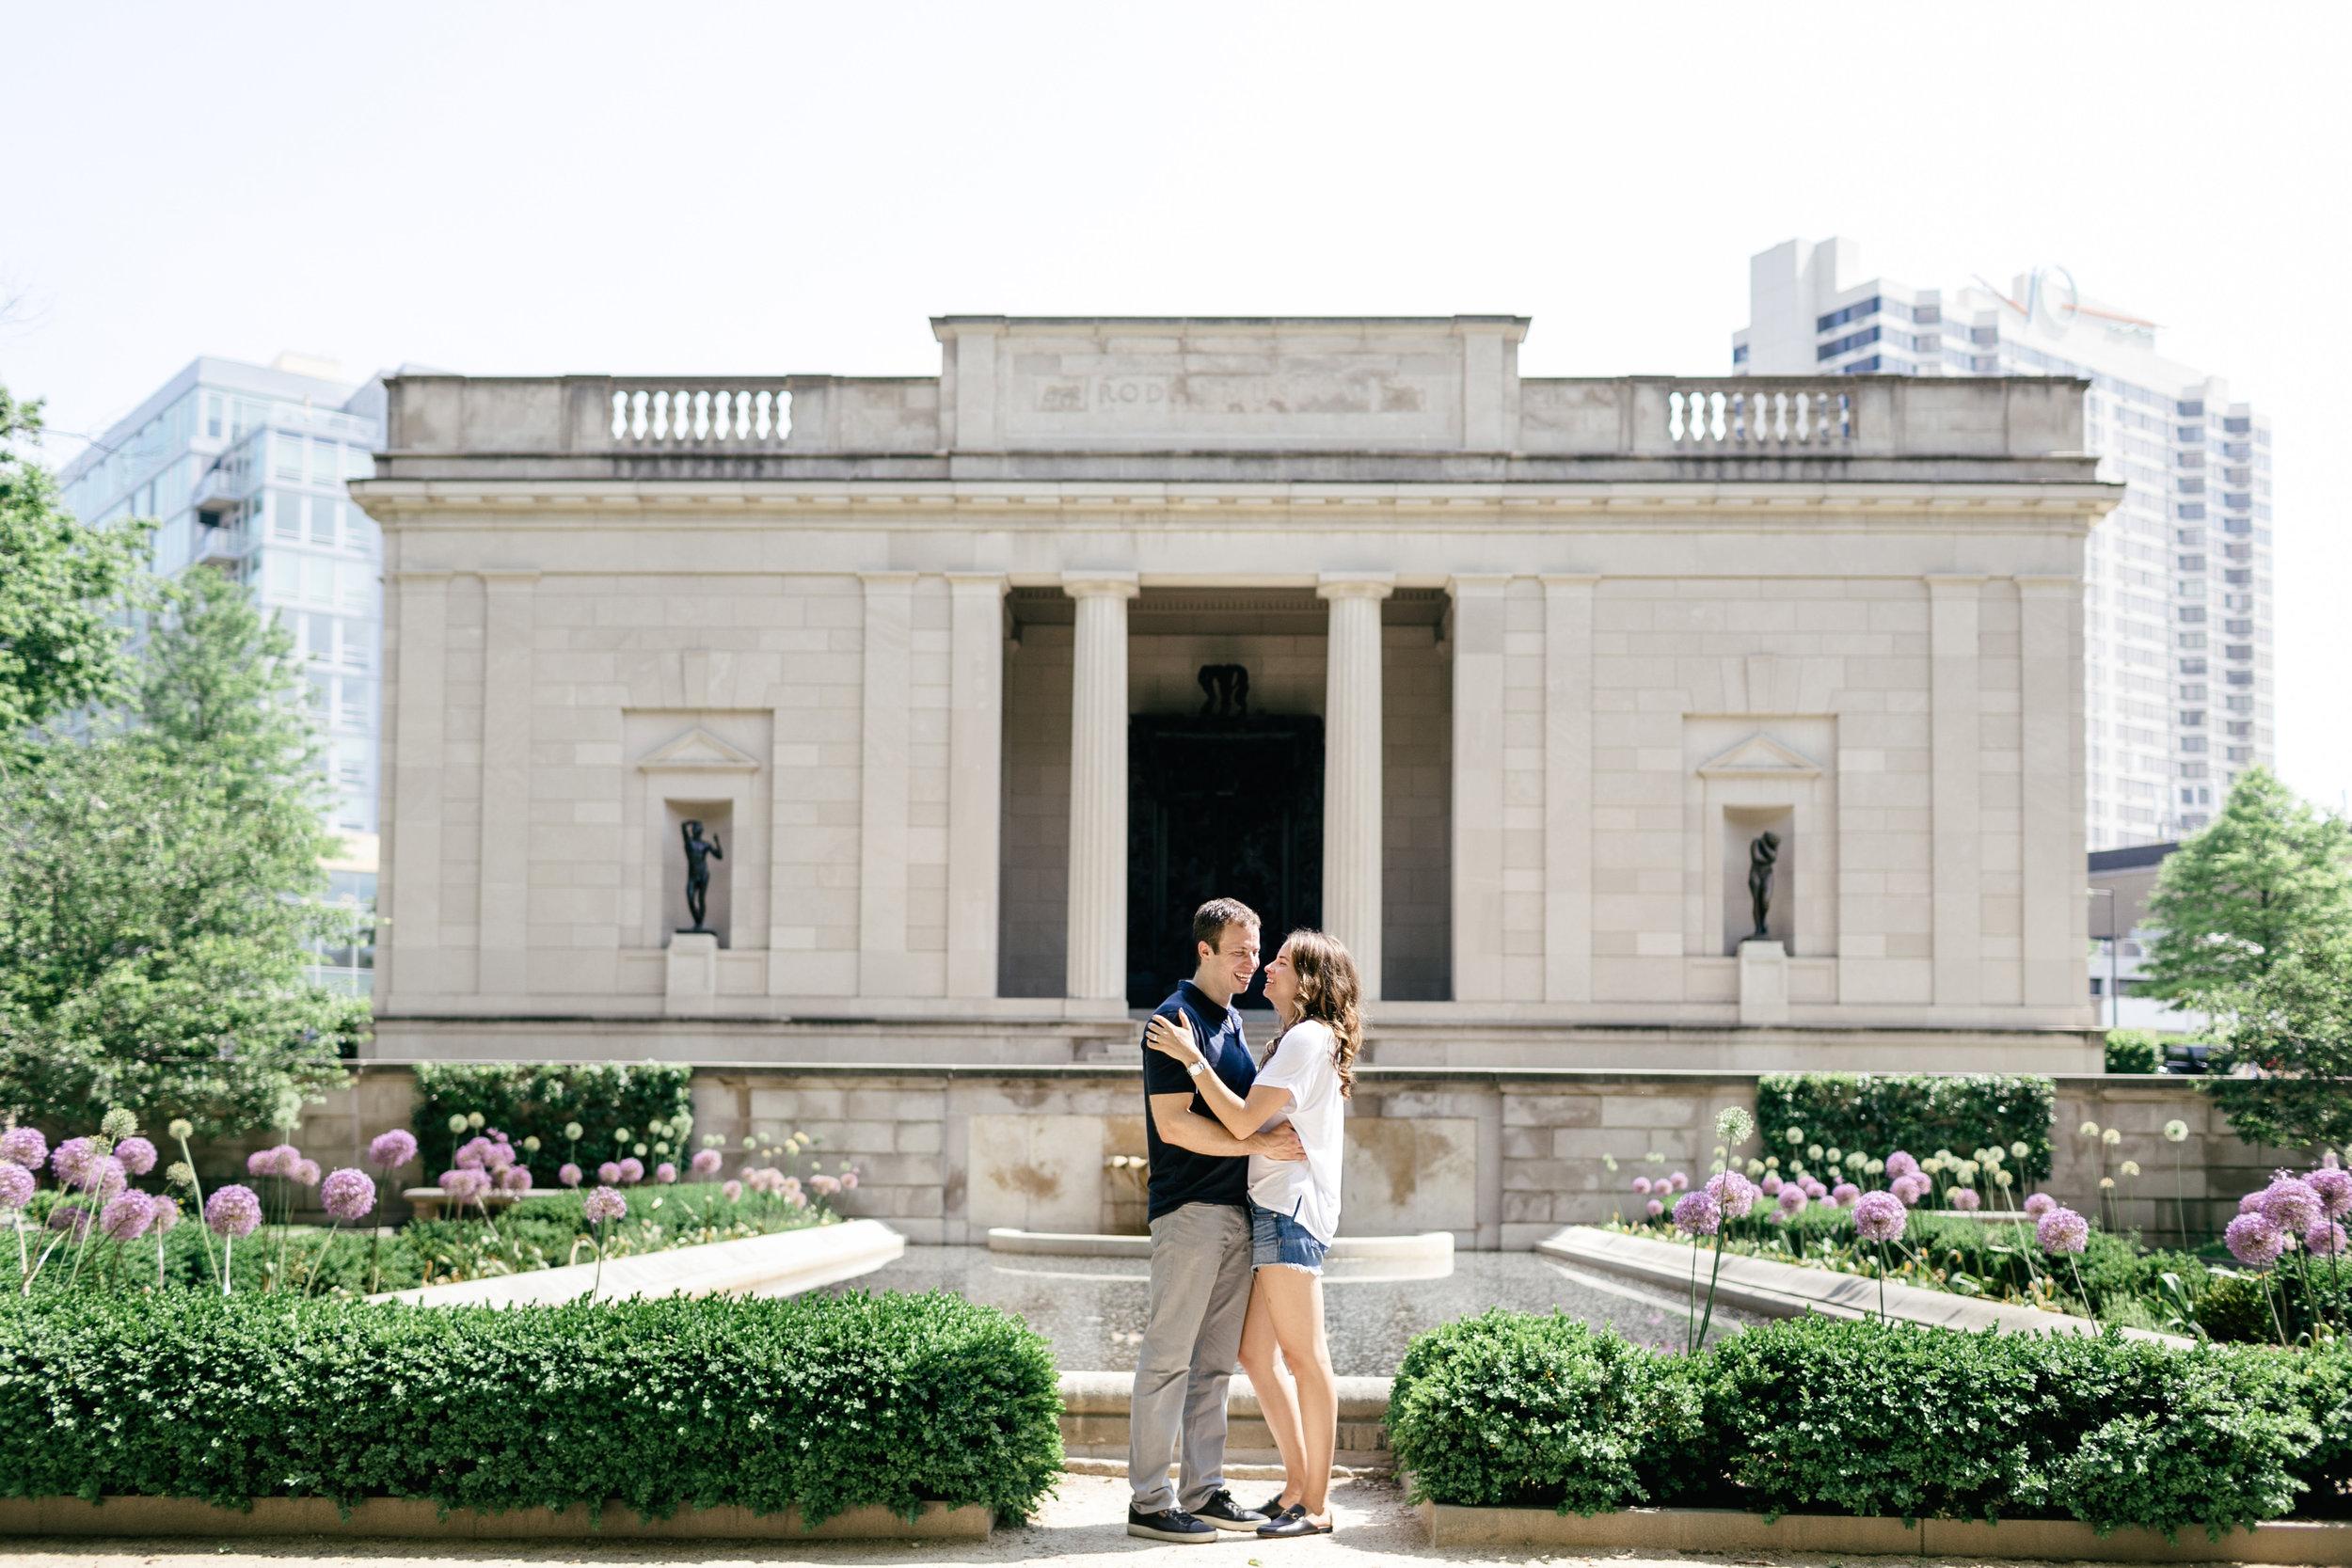 photography-natural-candid-engaged-proposal-philadelphia-wedding-rodin museum-barnes foundation-parkway-modern-lifestyle-12.JPG